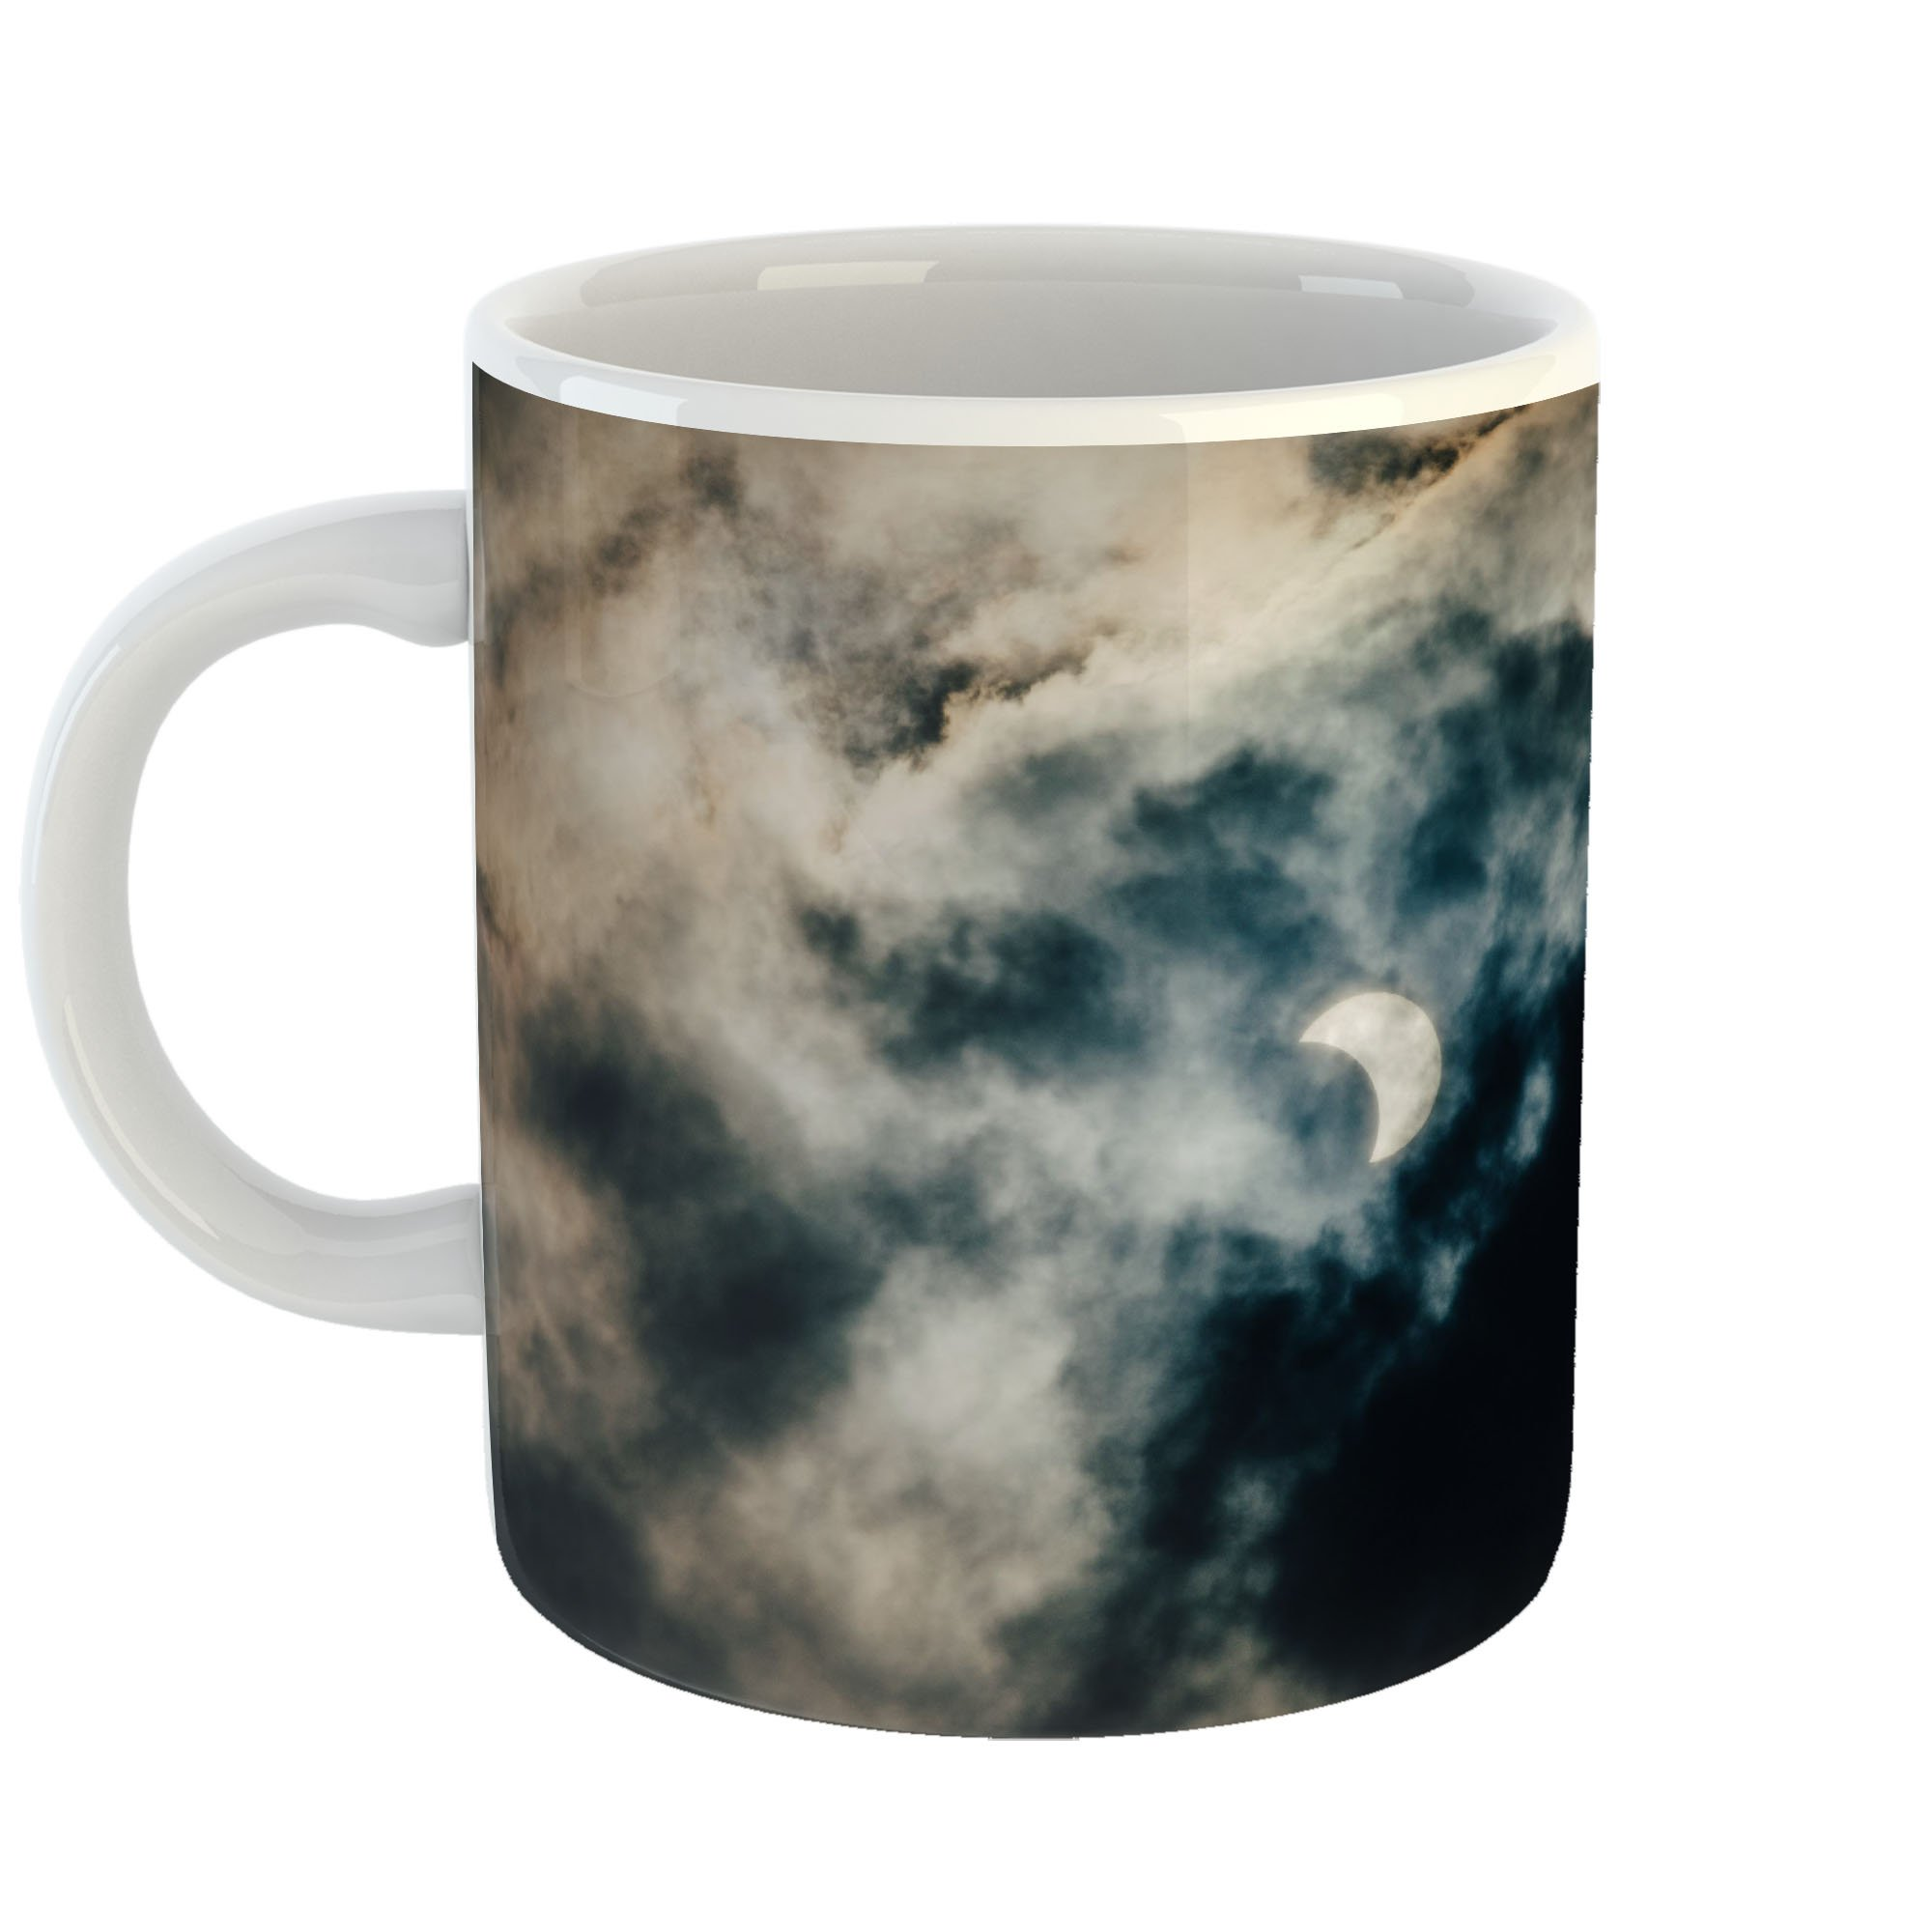 Westlake Art - Solar Sun - 11oz Coffee Cup Mug - Modern Picture Photography Artwork Home Office Birthday Gift - 11 Ounce (0880-F8C4B)